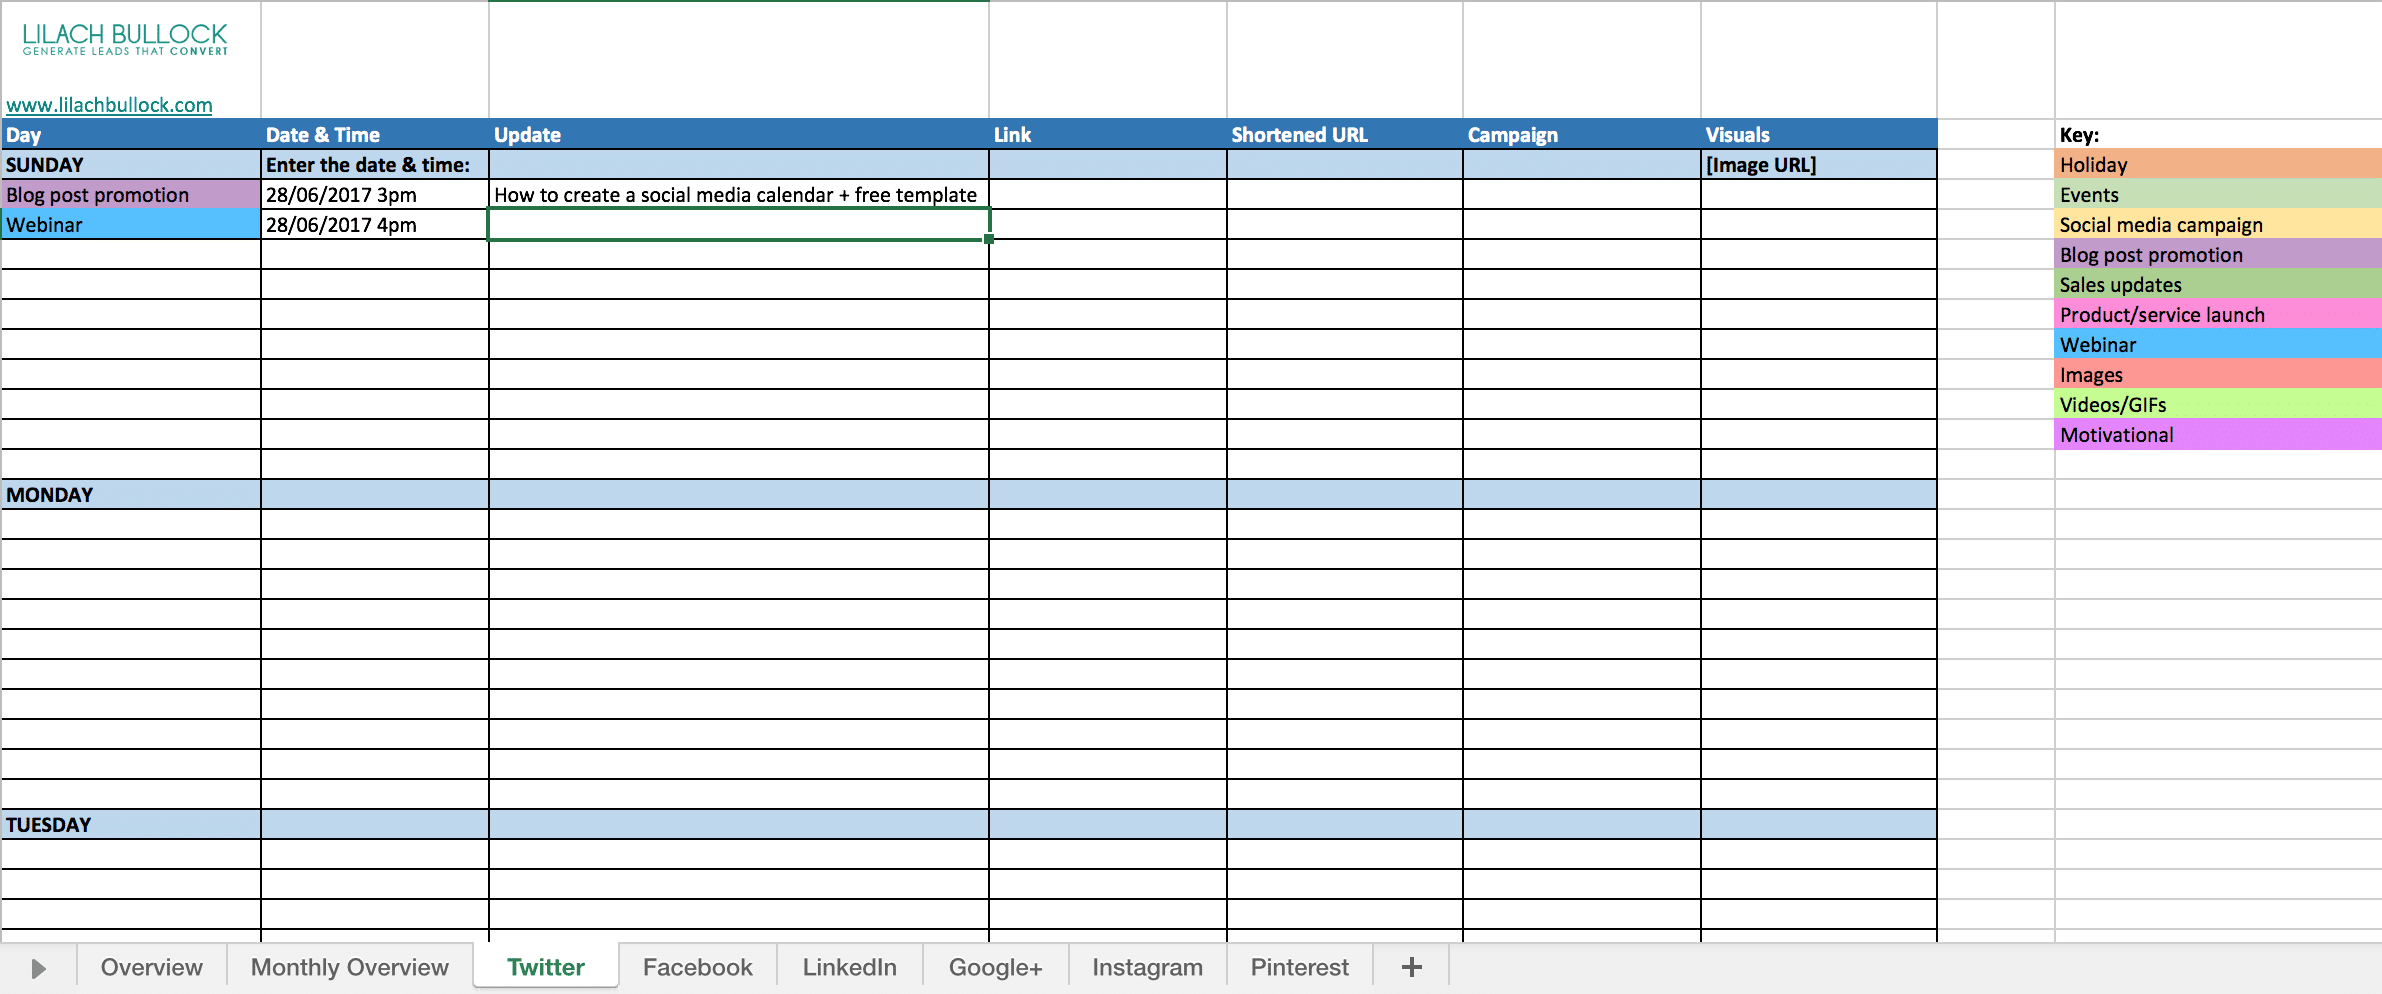 How To Create A Social Media Calendar + Free Template How To Make A Color Coded Calendar Parenting Time